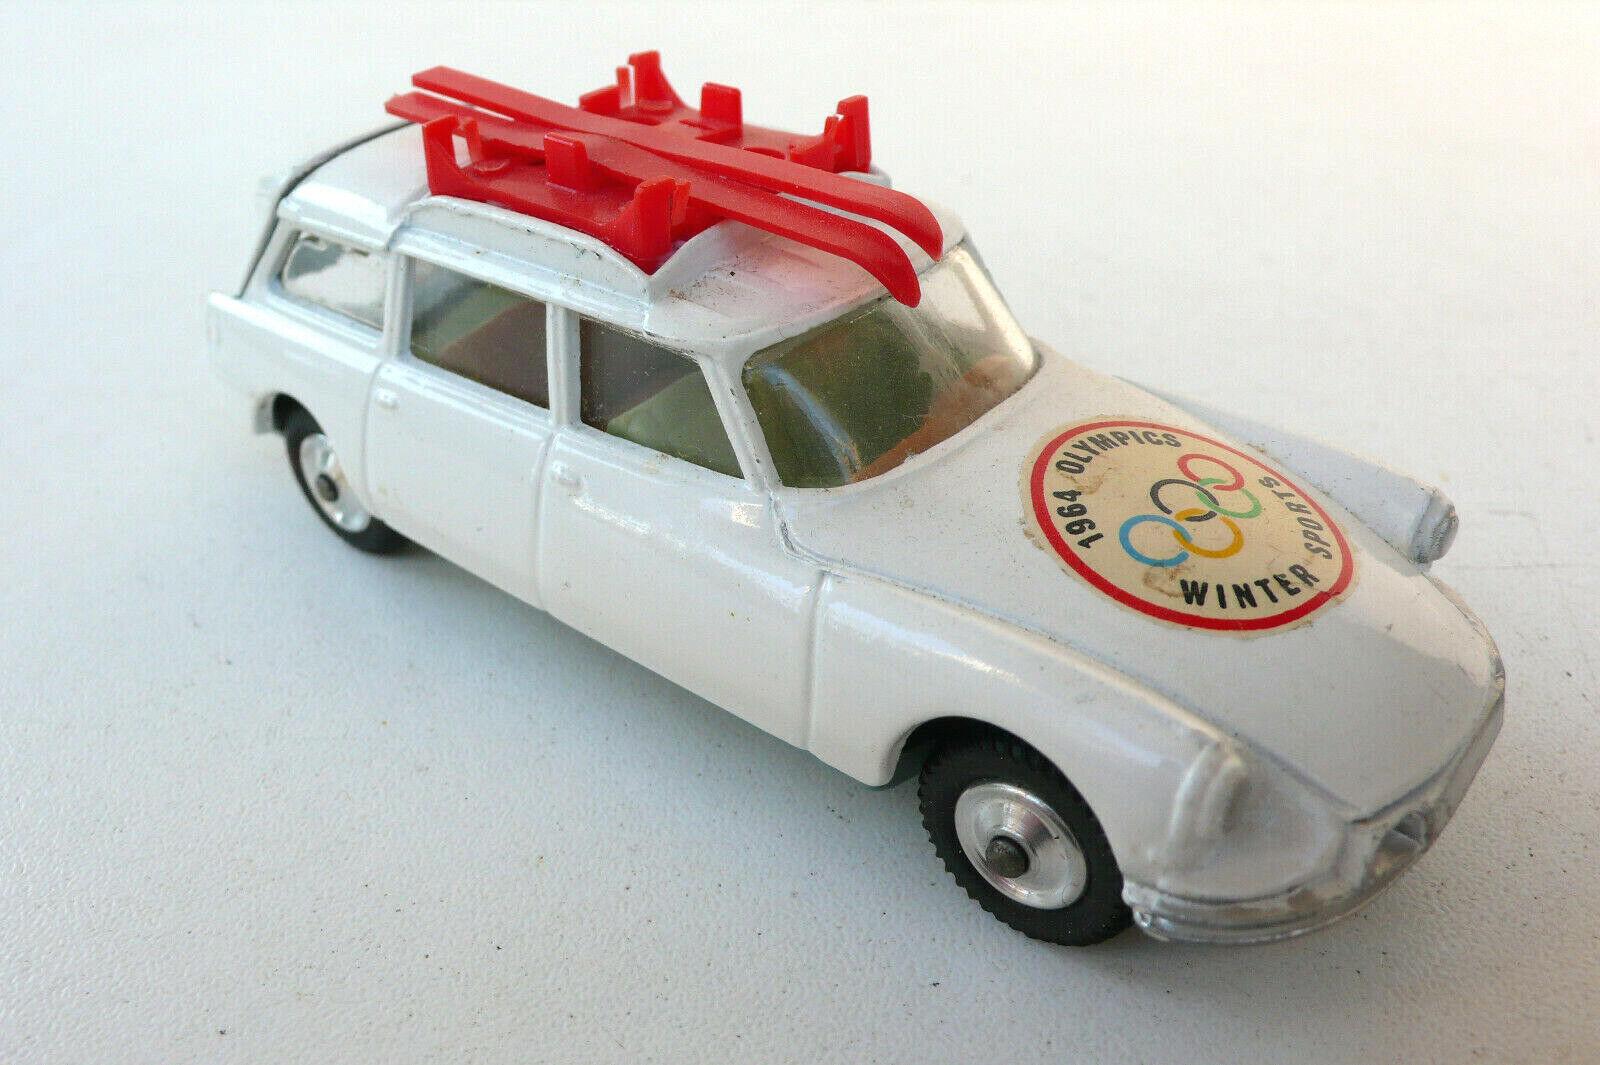 CORGI SpielzeugS   CITROEN DS SAFARI    OLYMPICS WINTER SPORTS 1964   BON ÉTAT